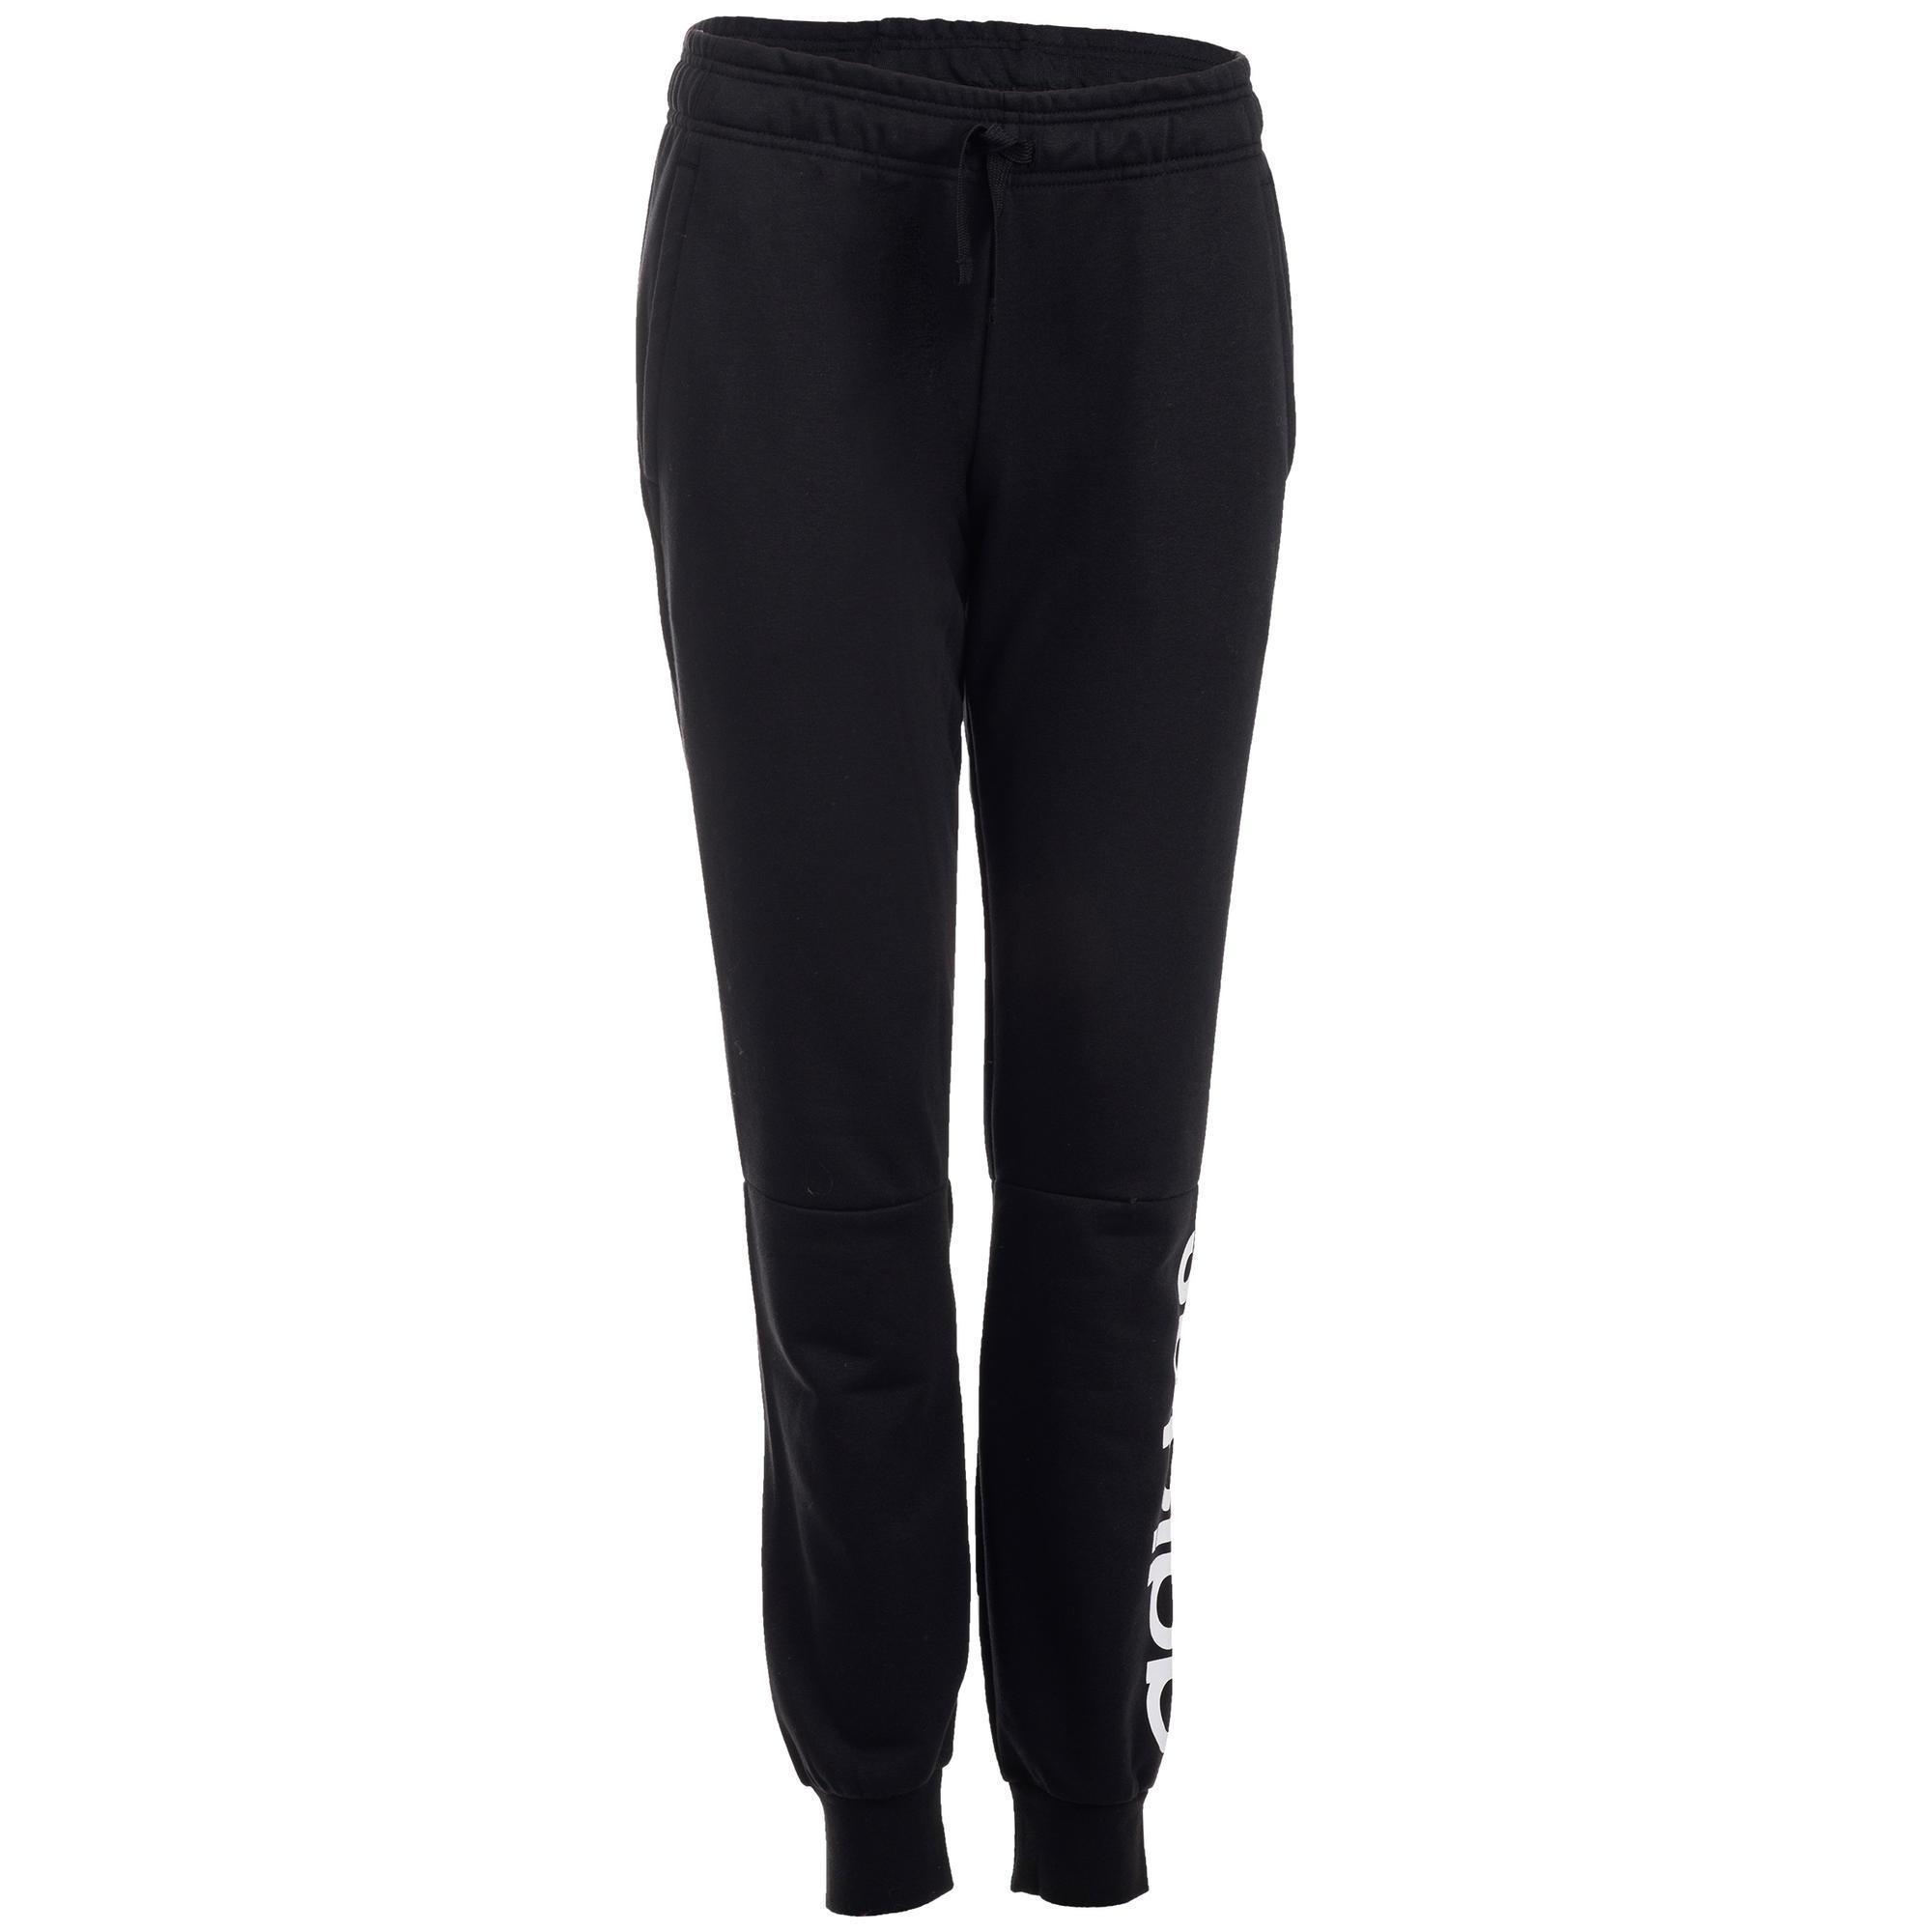 Adidas Essentials Linear women's training pants (black-white) M